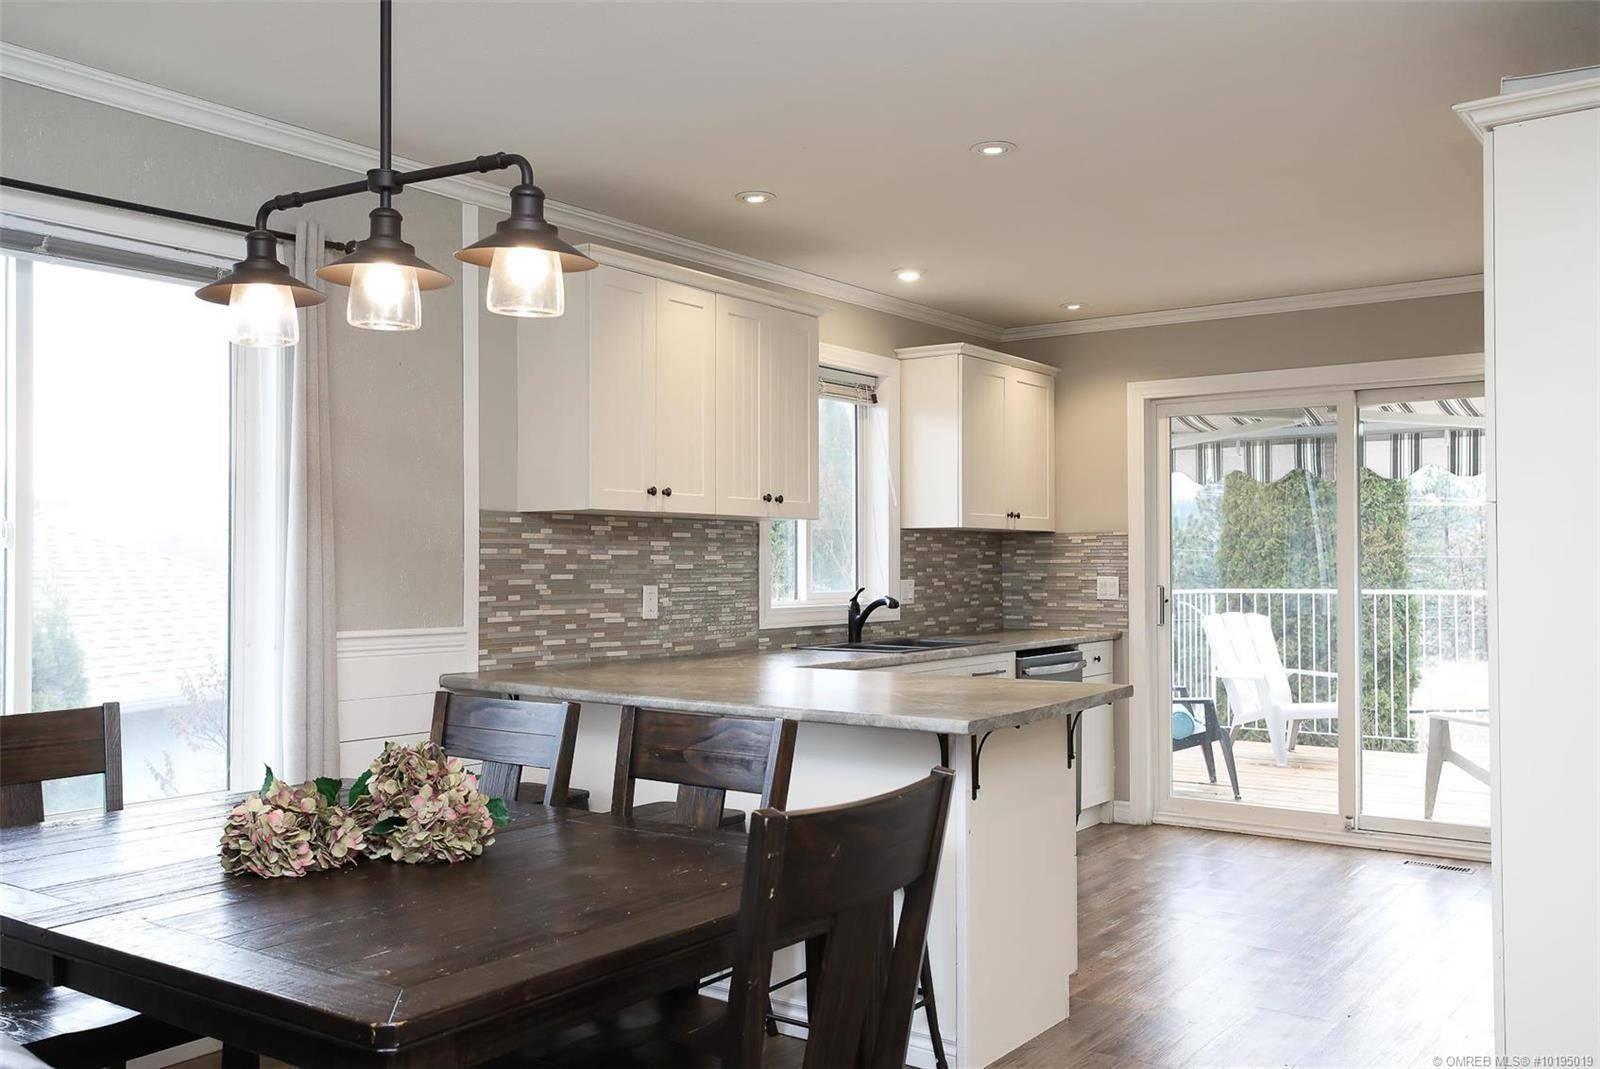 House for sale at 2440 Old Okanagan Hy Unit 150 West Kelowna British Columbia - MLS: 10195019